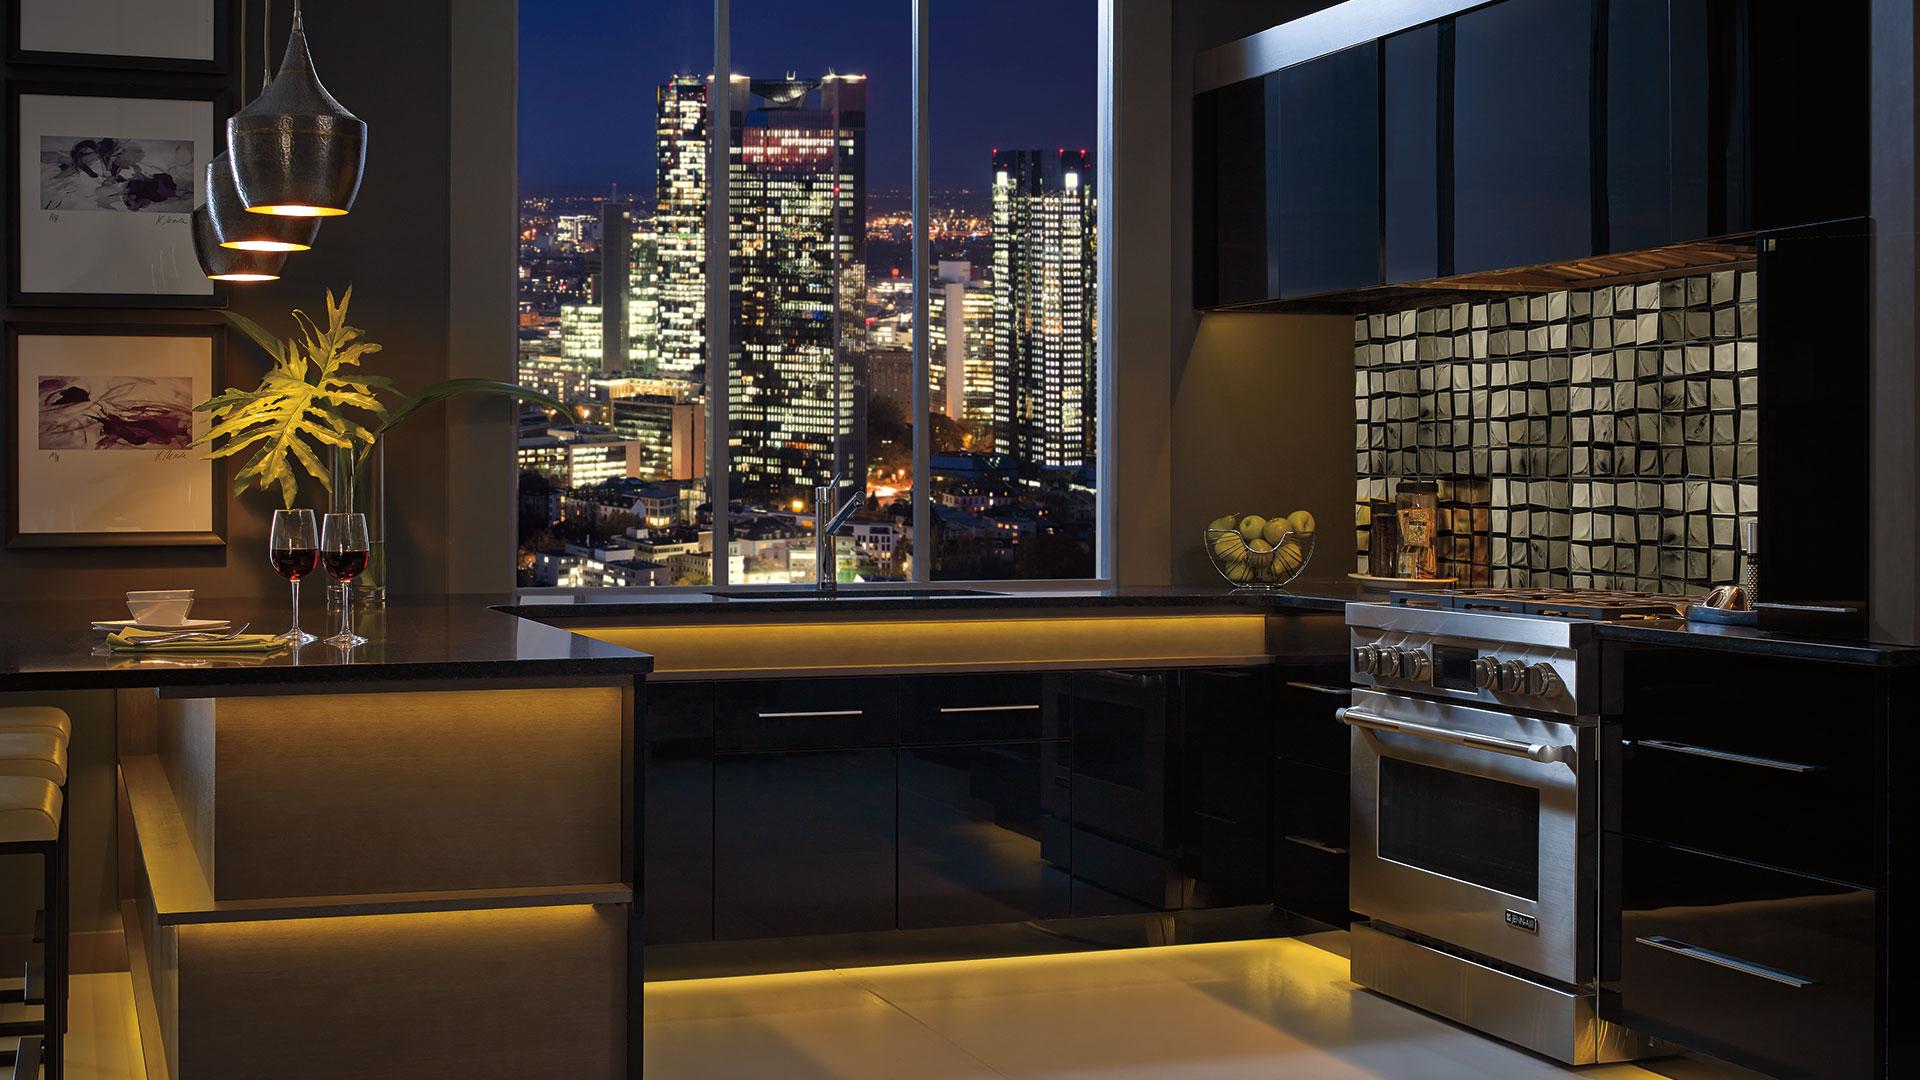 acrylic kitchen cabinets honey oak contemporary in black finish design style room